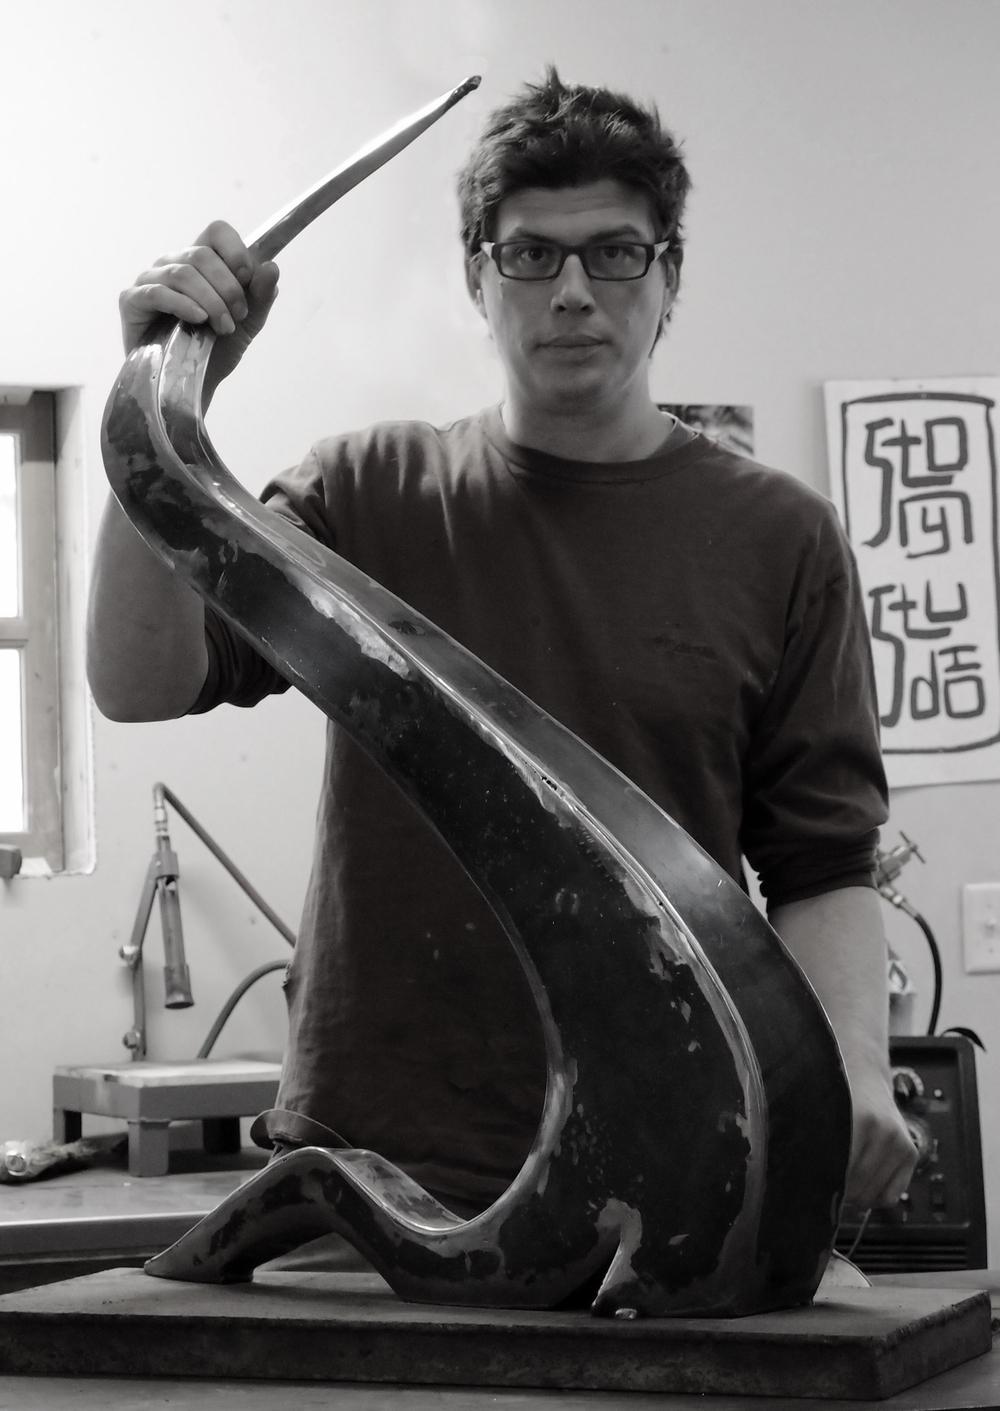 Justin in his studio